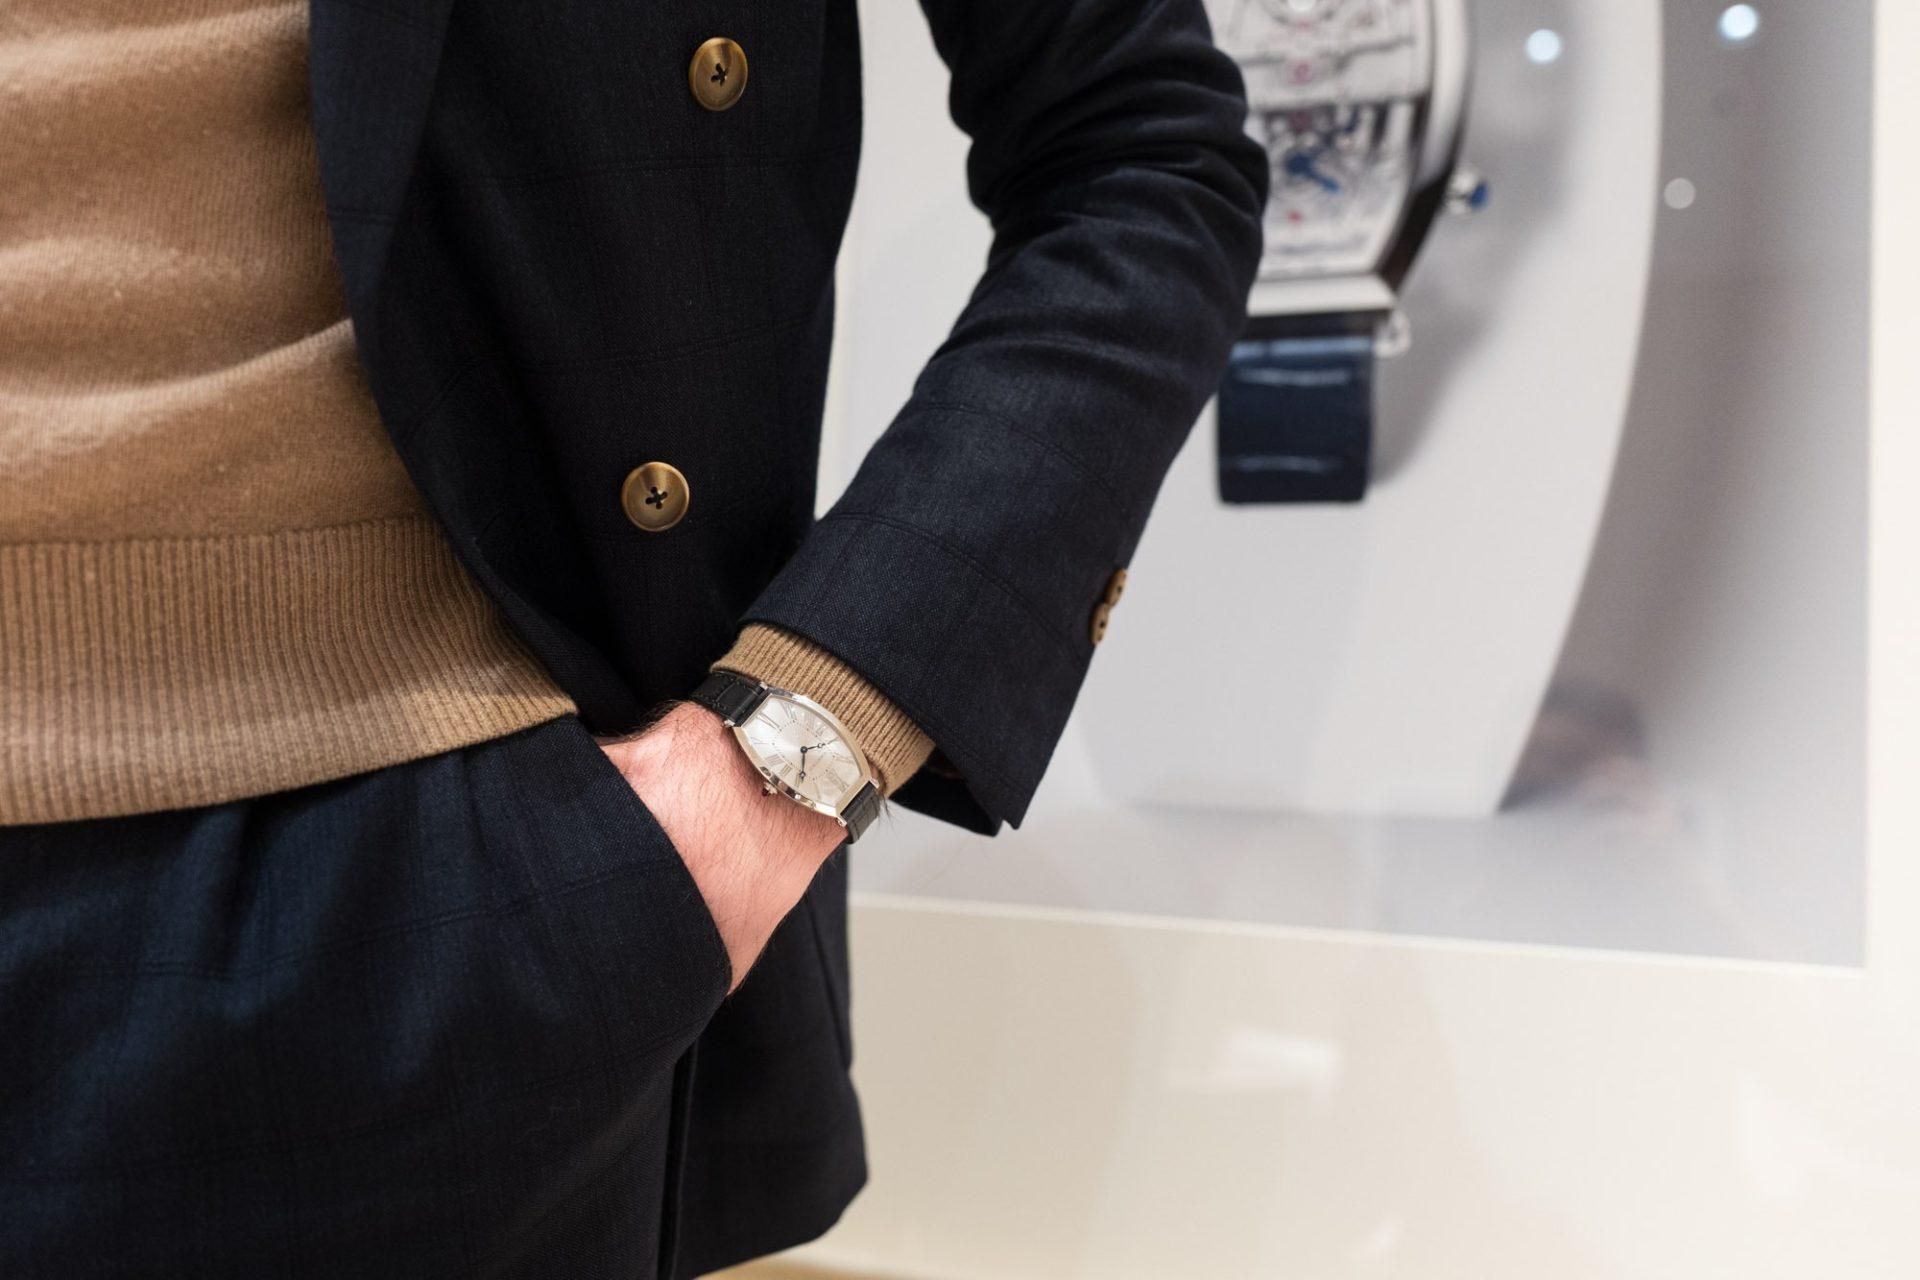 SIHH 2019 - Cartier Privé Tonneau